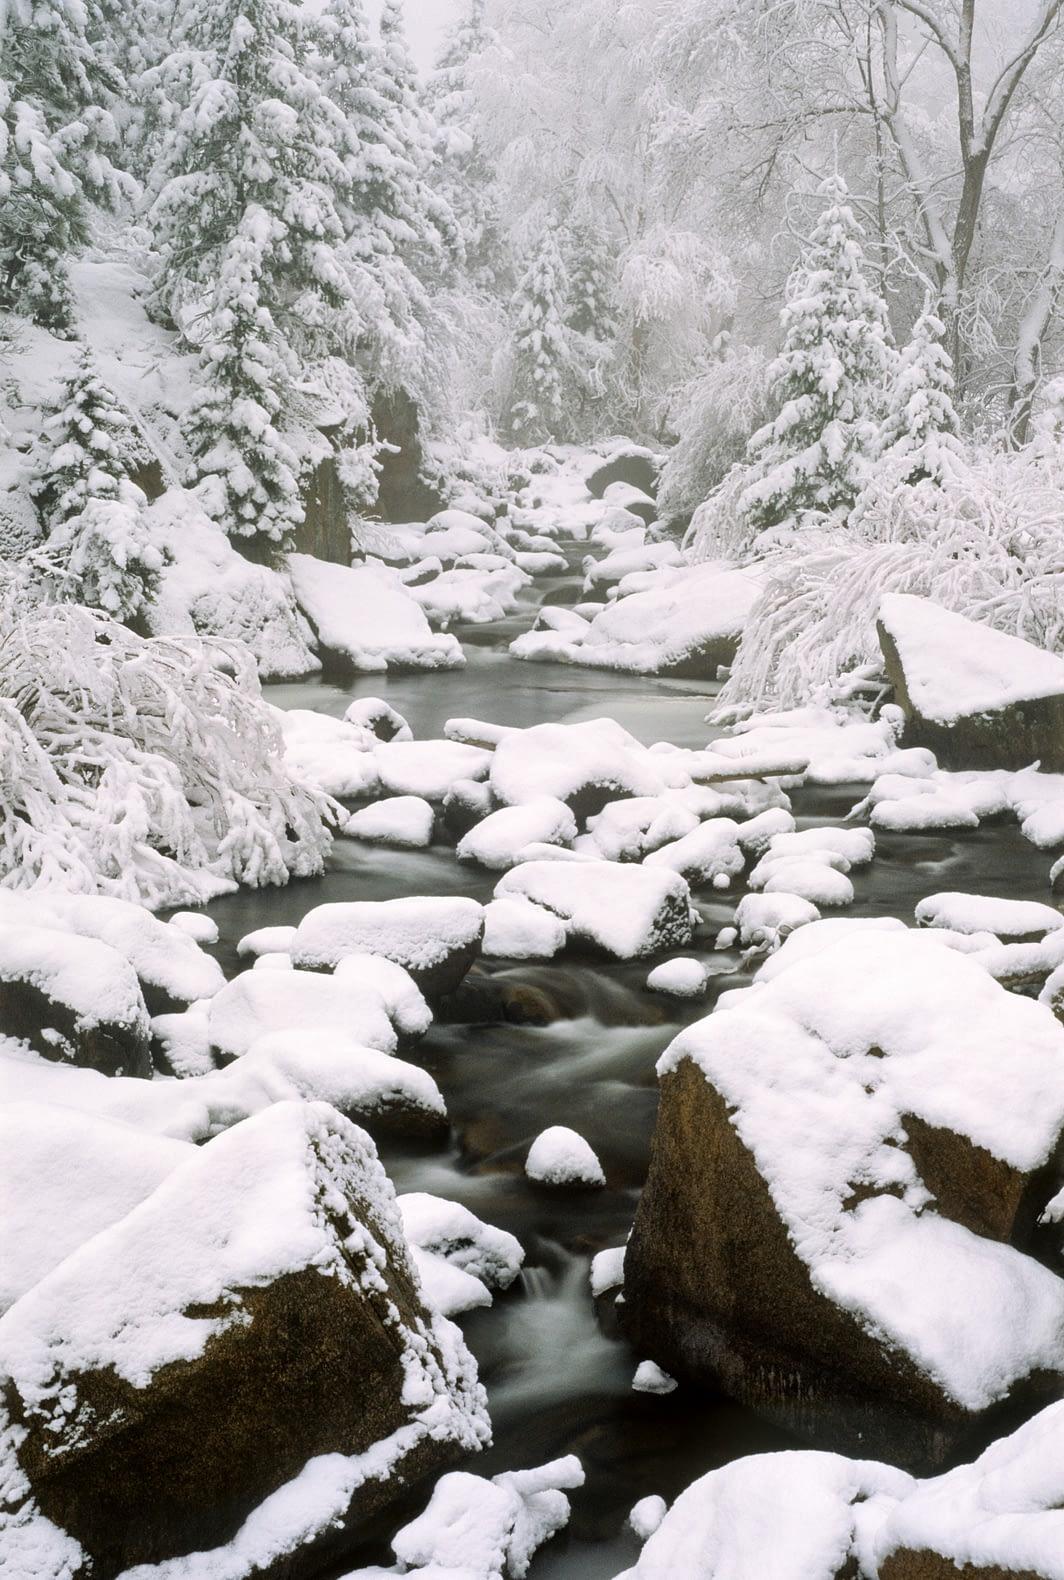 South Saint Vrain in Snow